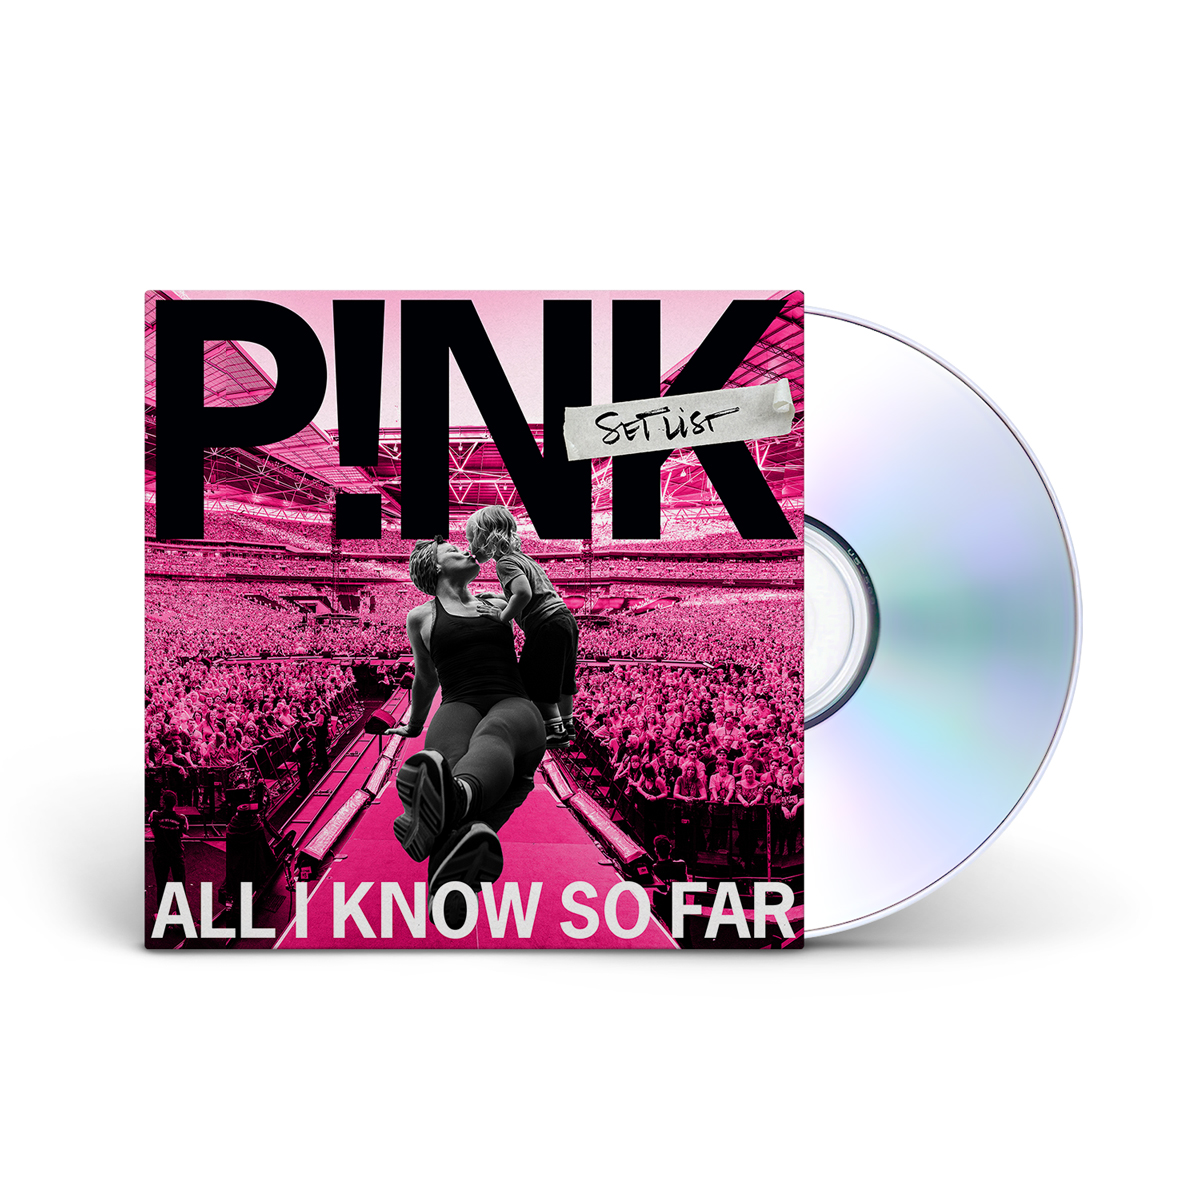 All I Know So Far - The Setlist CD [Explicit]